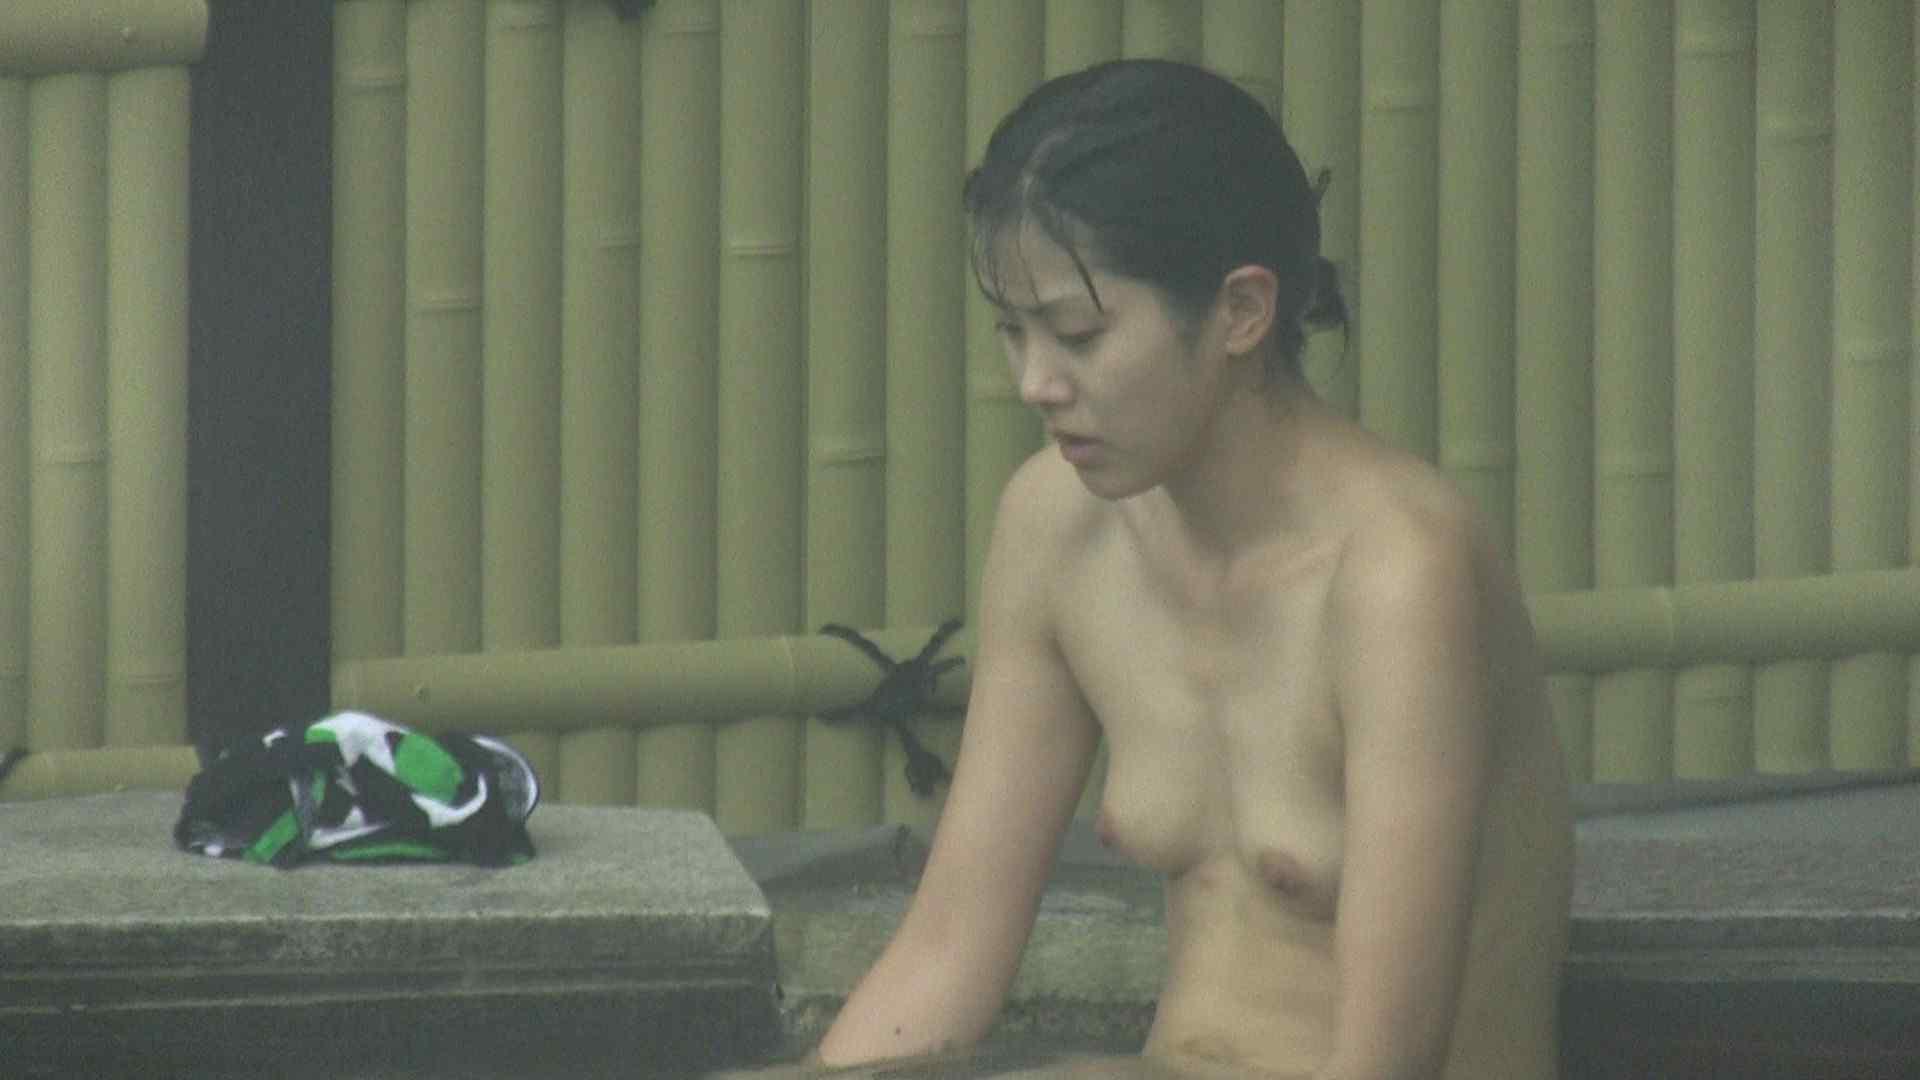 Aquaな露天風呂Vol.174 盗撮シリーズ | 露天風呂編  86PIX 7